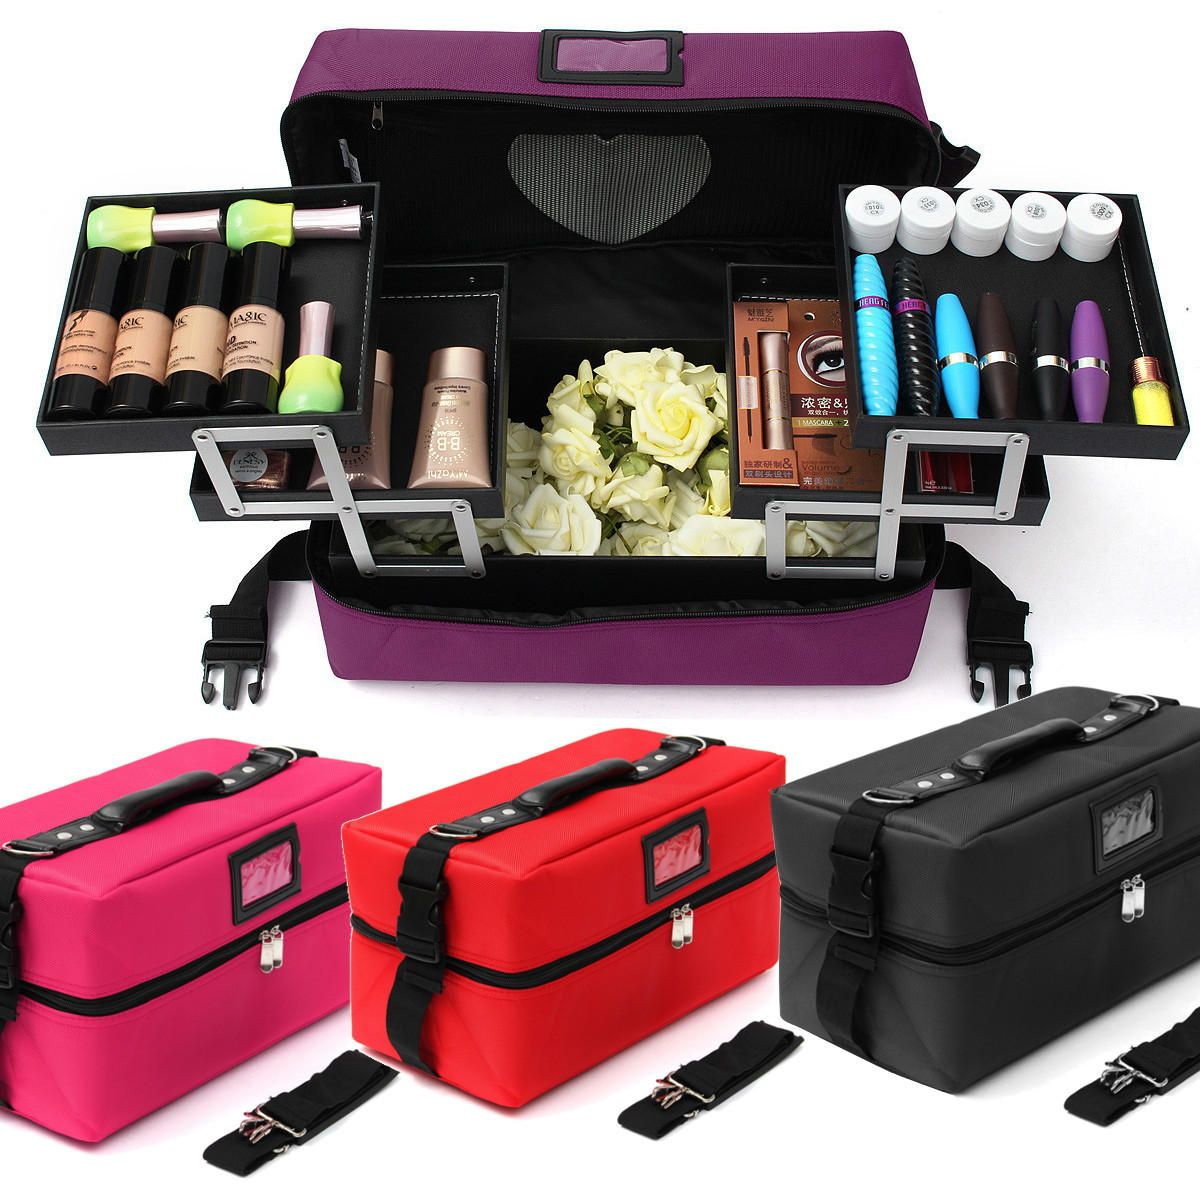 NRT US$143.92 Makeup Cosmetic Organiser Case Jewellery Storage Trinket Zipper Box Holder